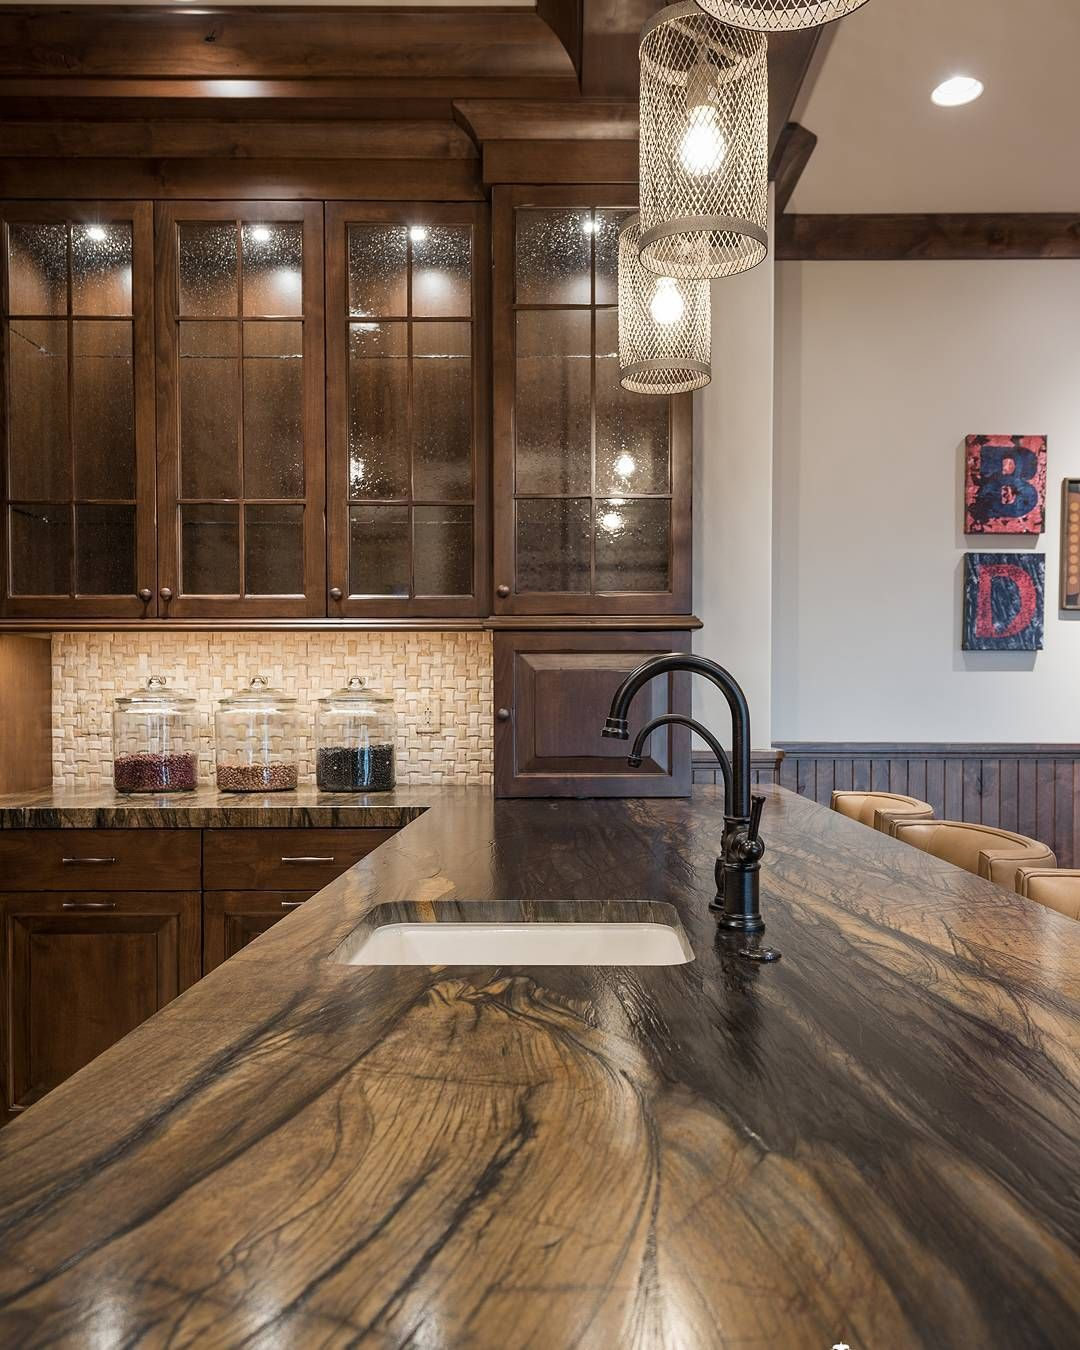 Stylish And Functional Bat Kitchen In Parkcity Utah Cameohomesinc Utahhomes Cabinetry Cabinets Countertops Houzz